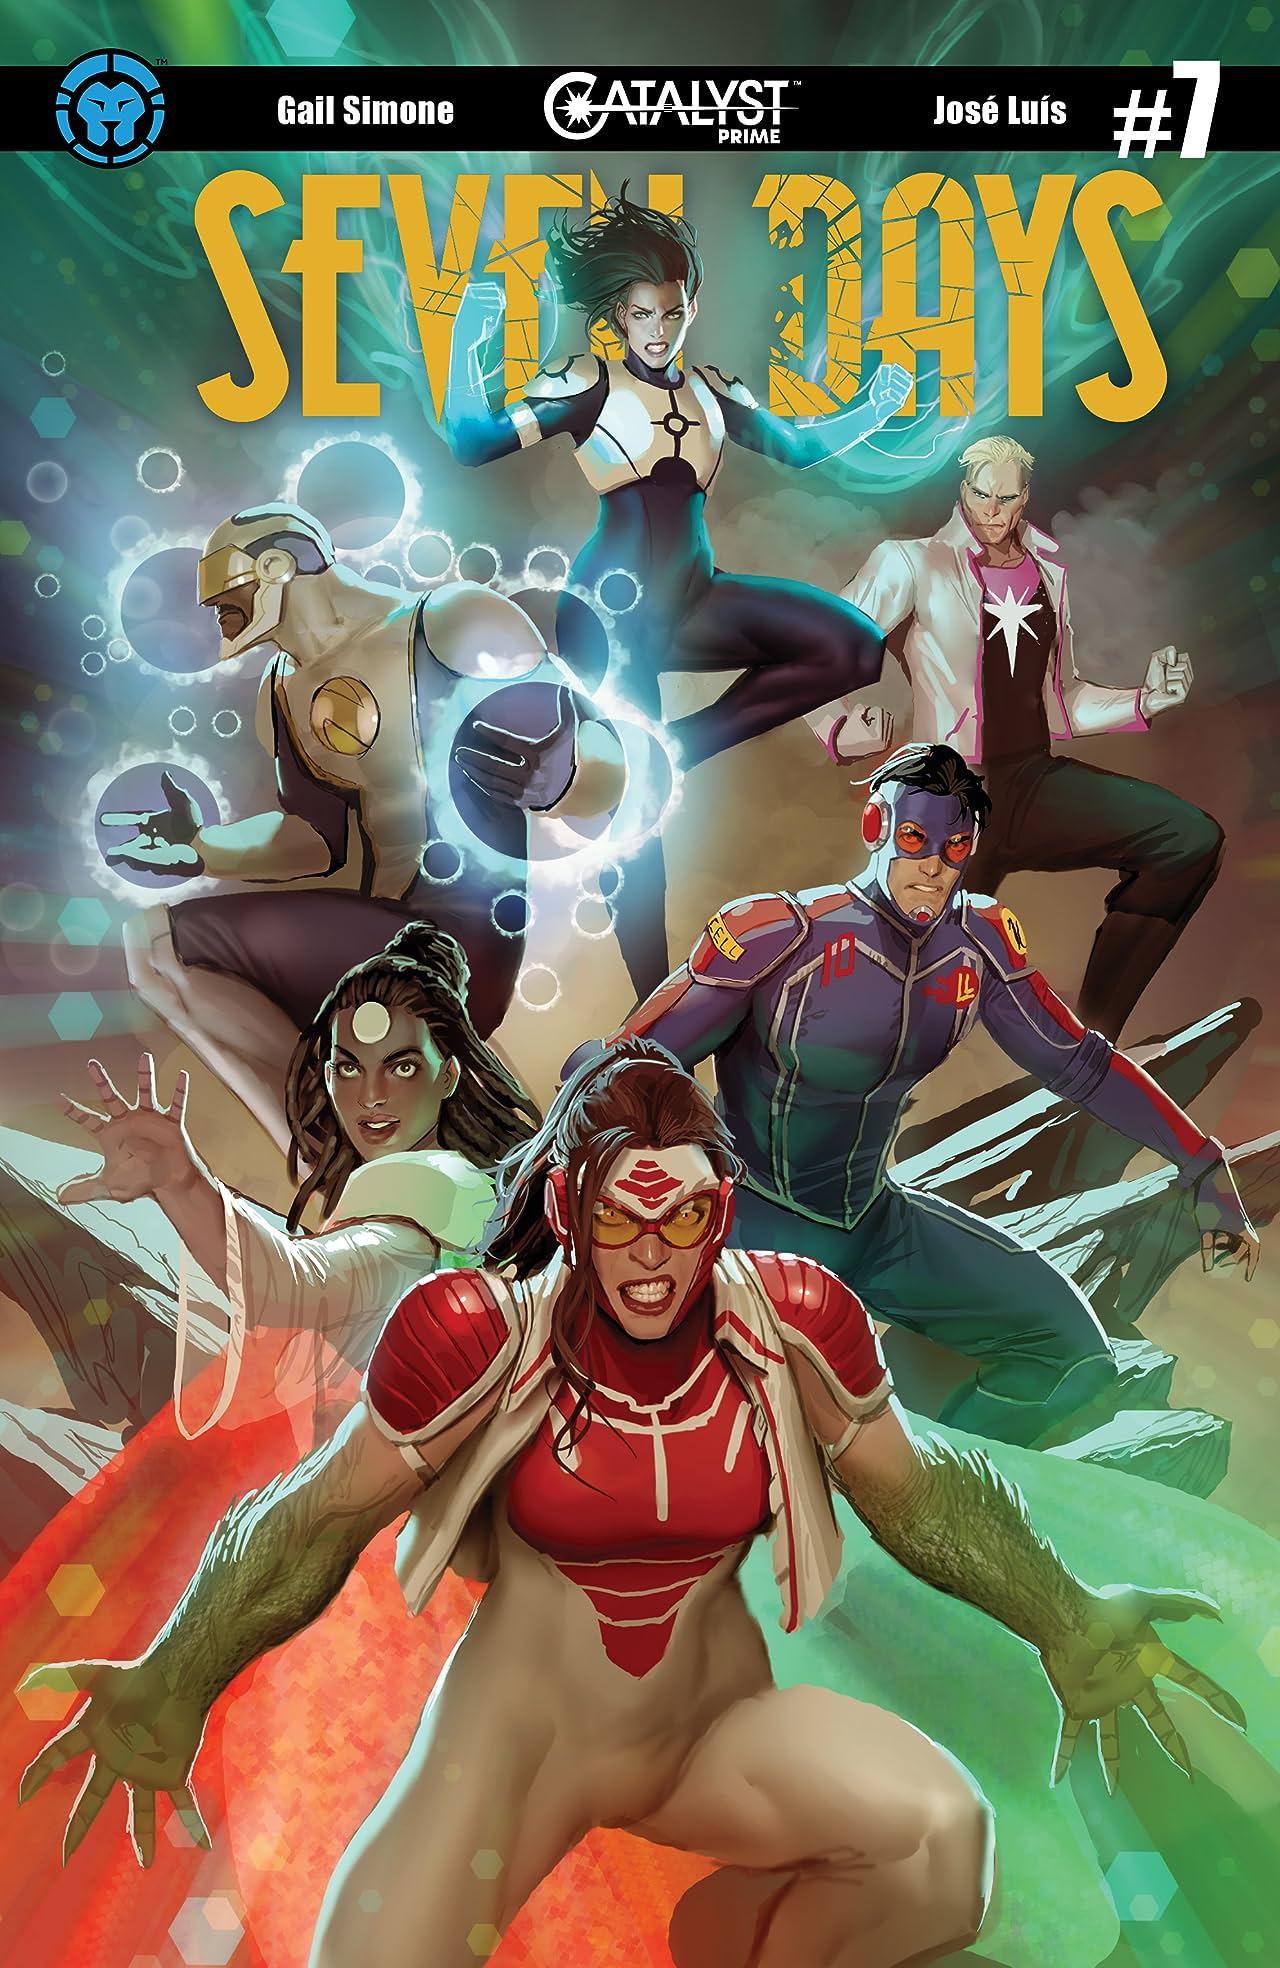 Catalyst Prime: Seven Days #7